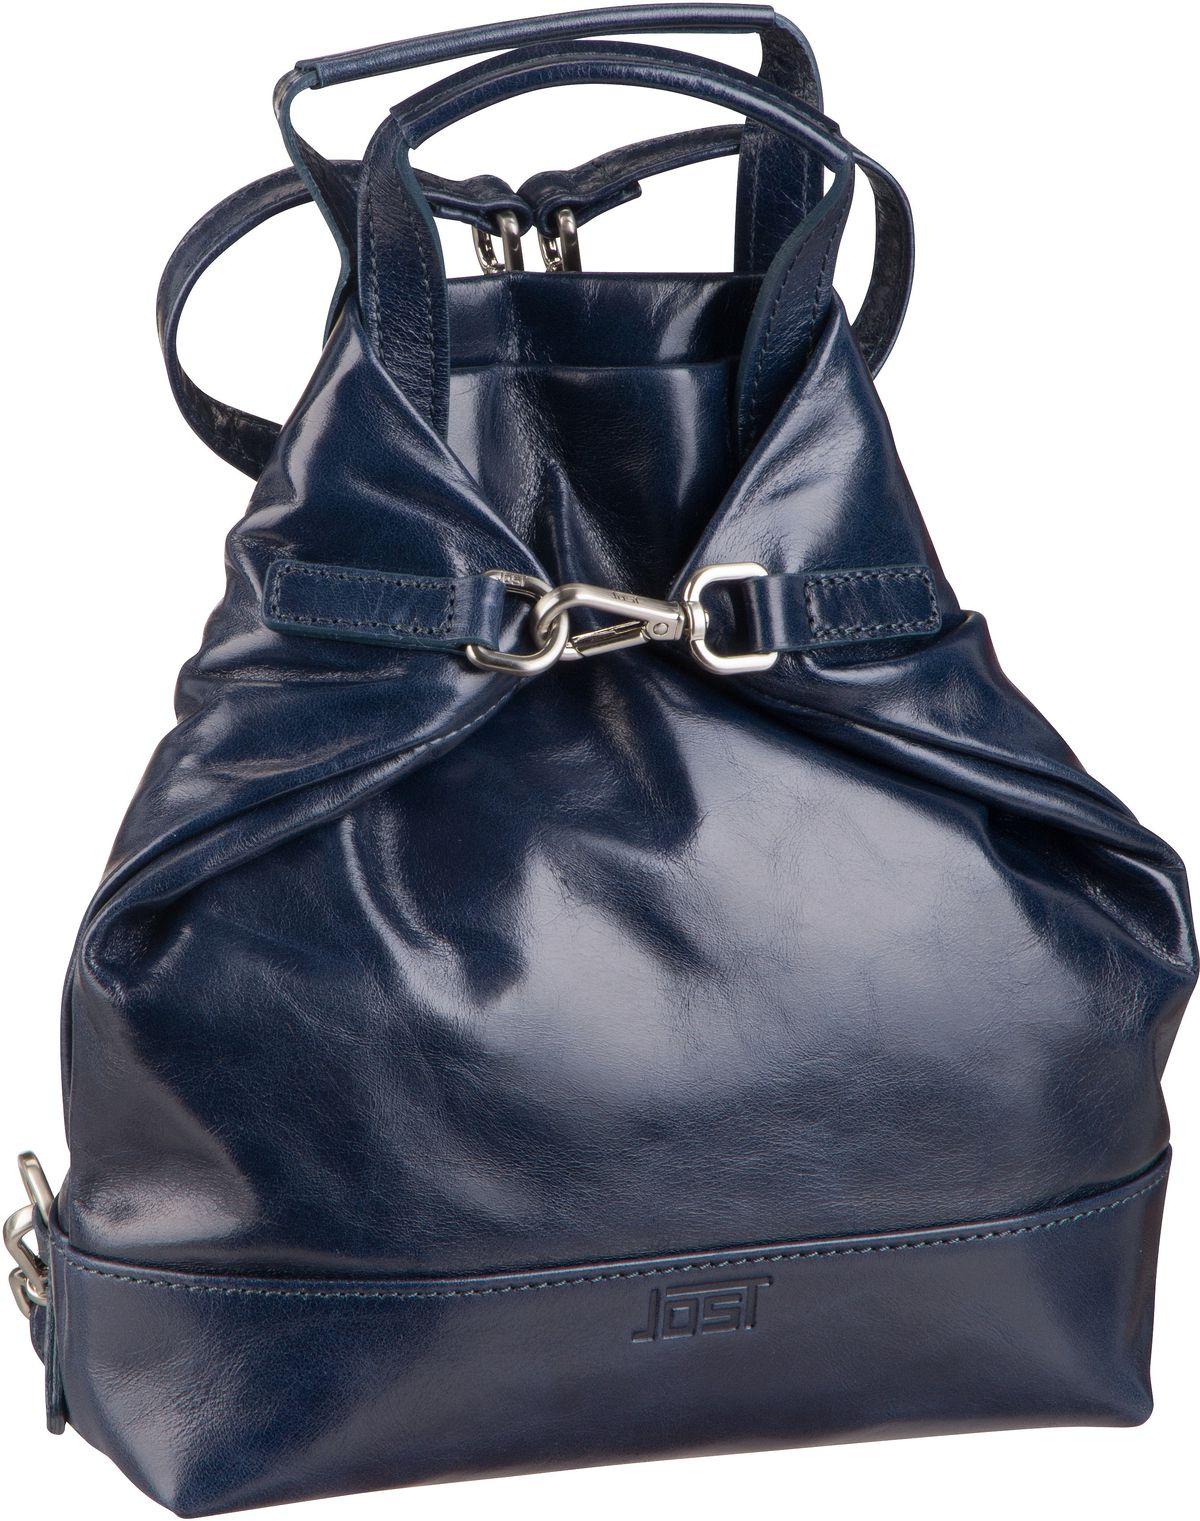 Rucksack / Daypack Boda 6617 X-Change Bag Mini Navy